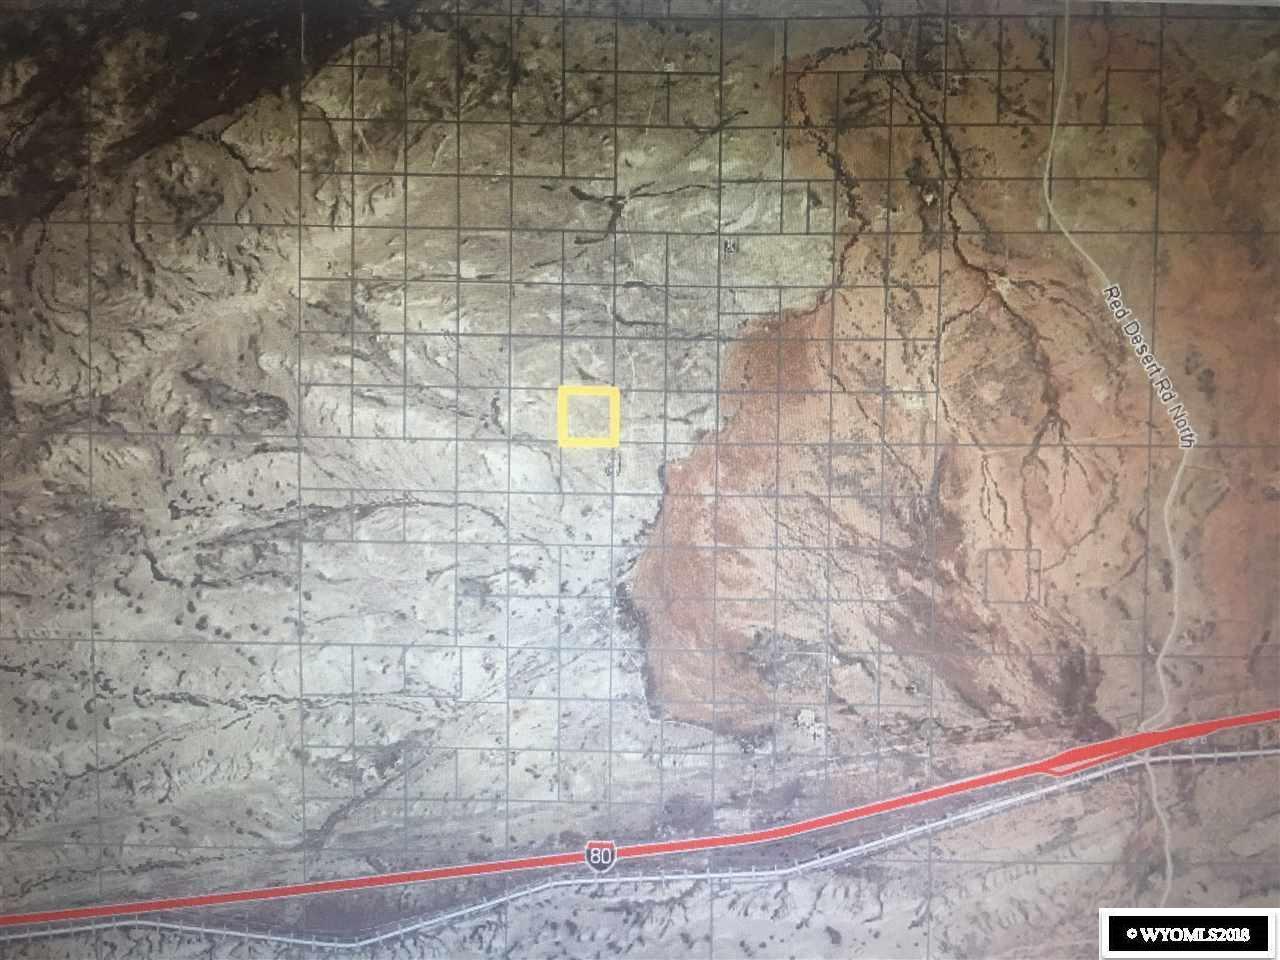 Sec 25 T20 R96 Red Desert Wy 82336 Mls 20186268 Lisa